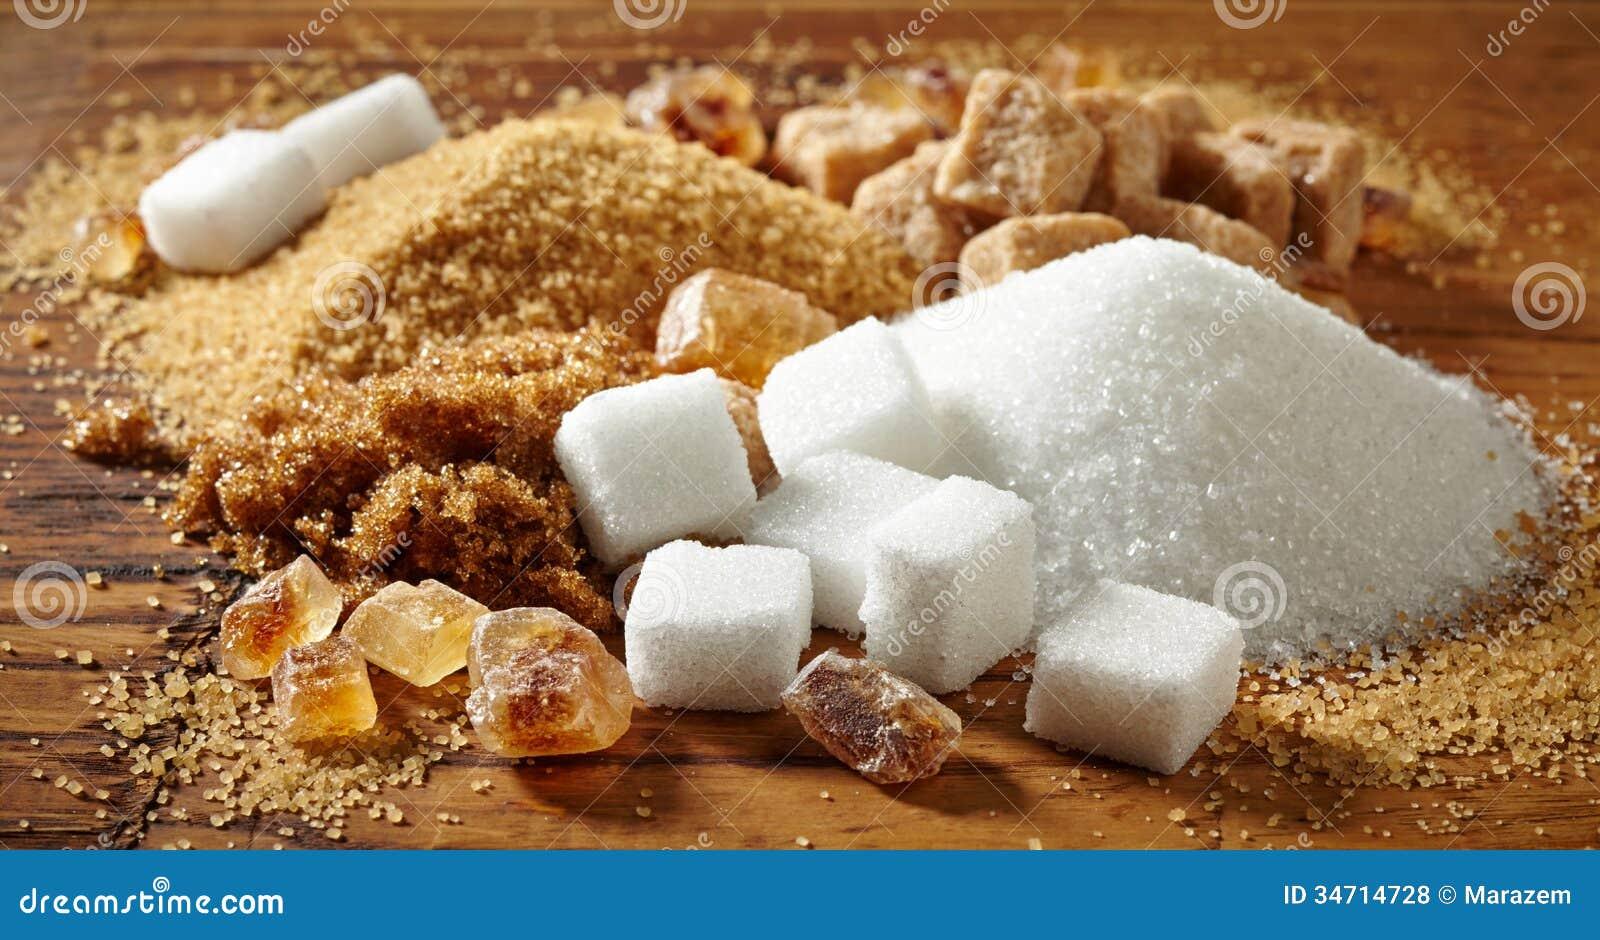 Olika typer av socker